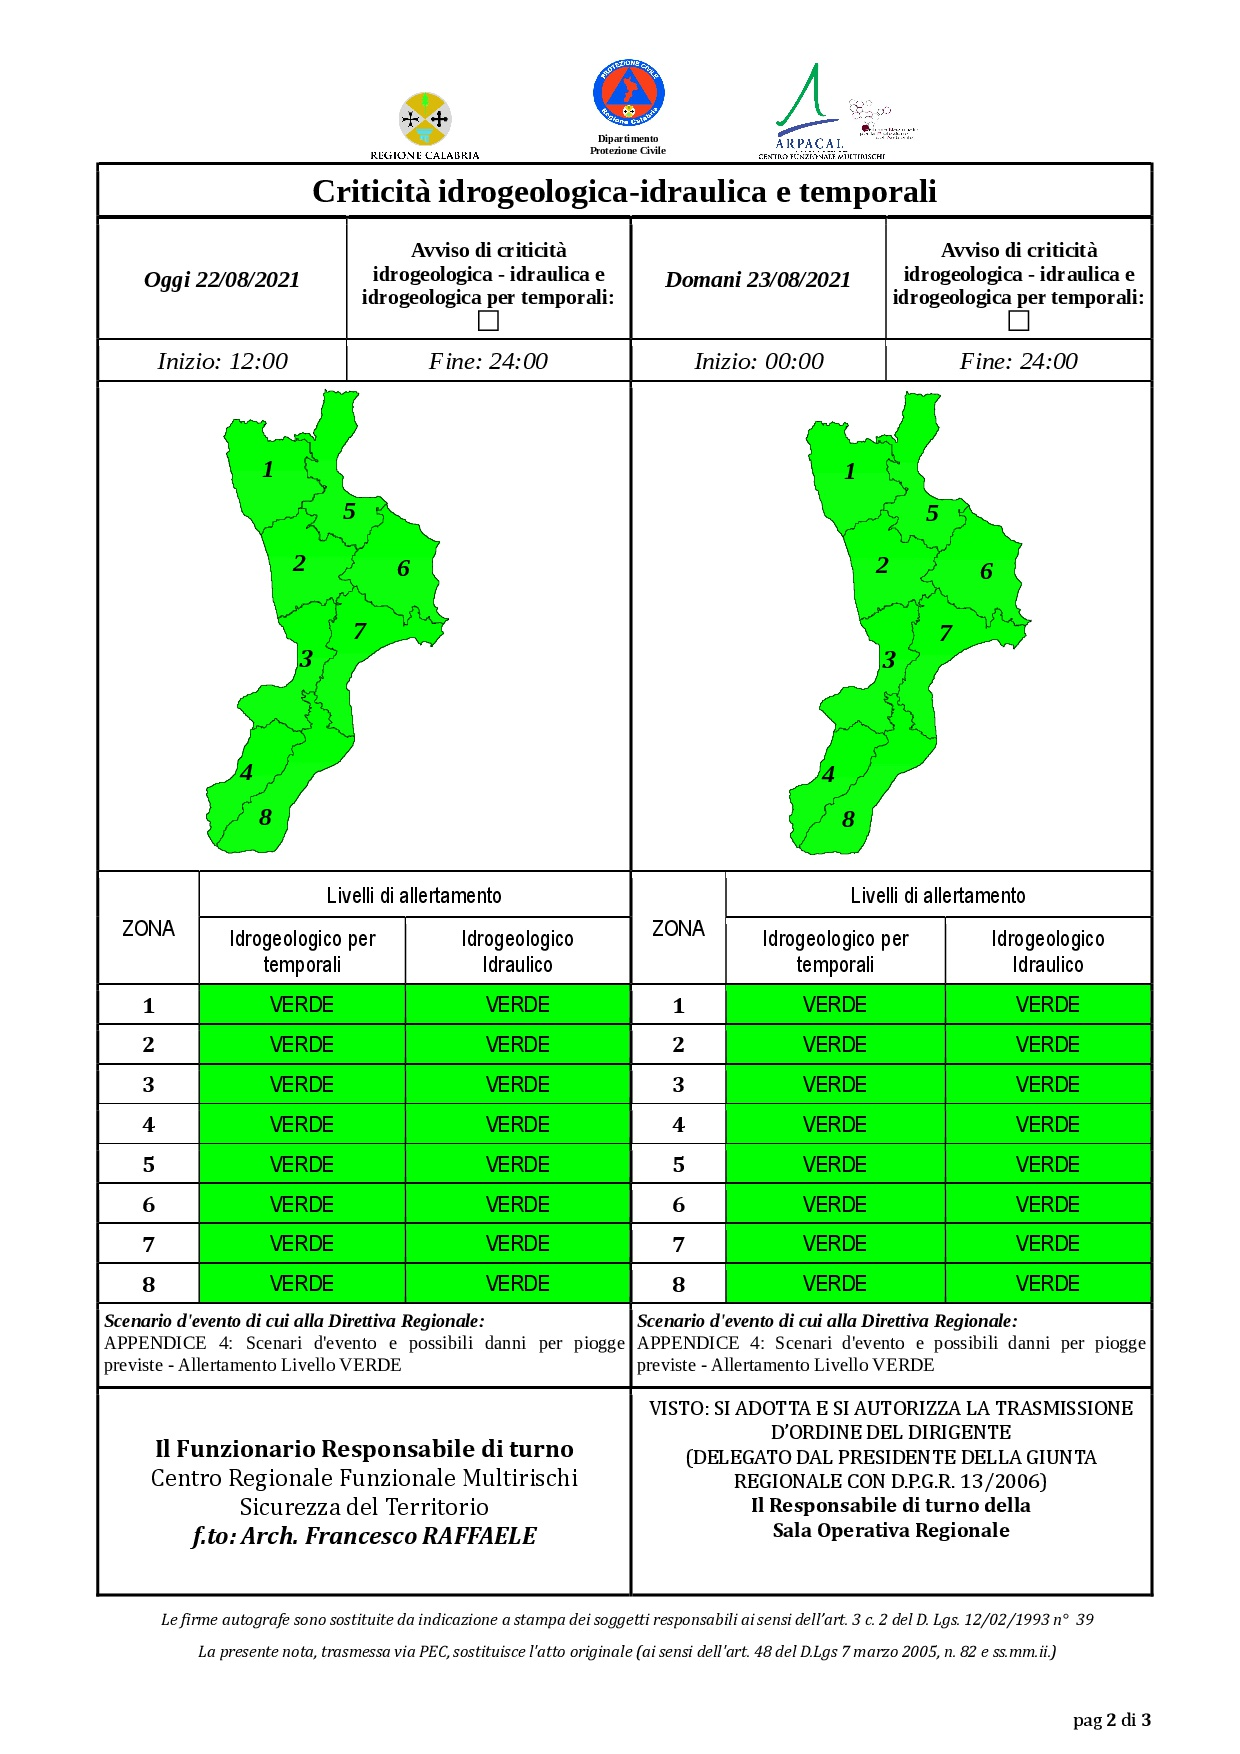 Criticità idrogeologica-idraulica e temporali in Calabria 22-08-2021